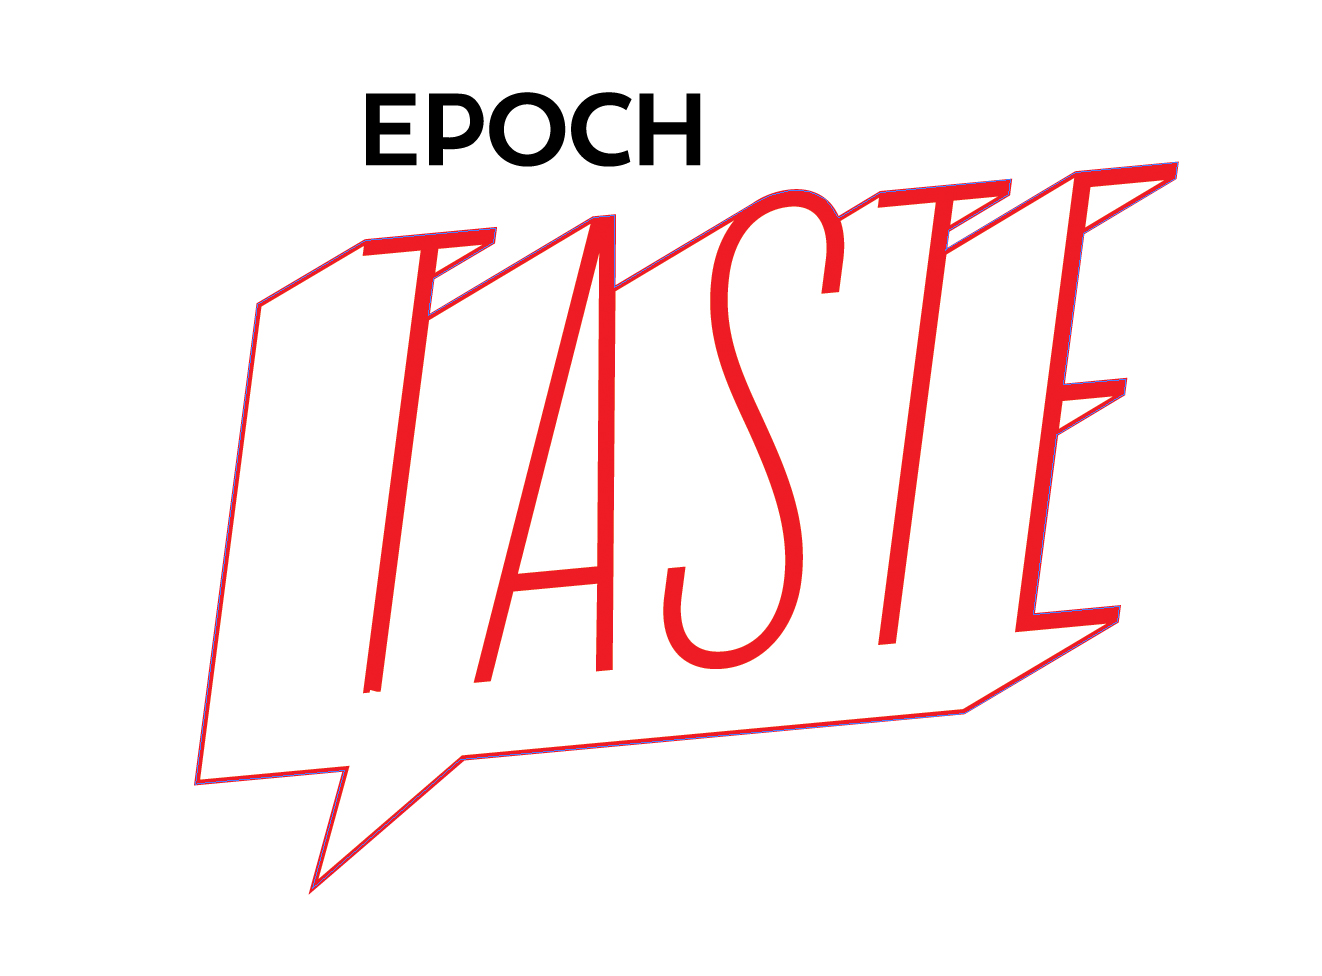 Epoch Taste Social Logo Concept. (Rob Counts/Epoch Times)